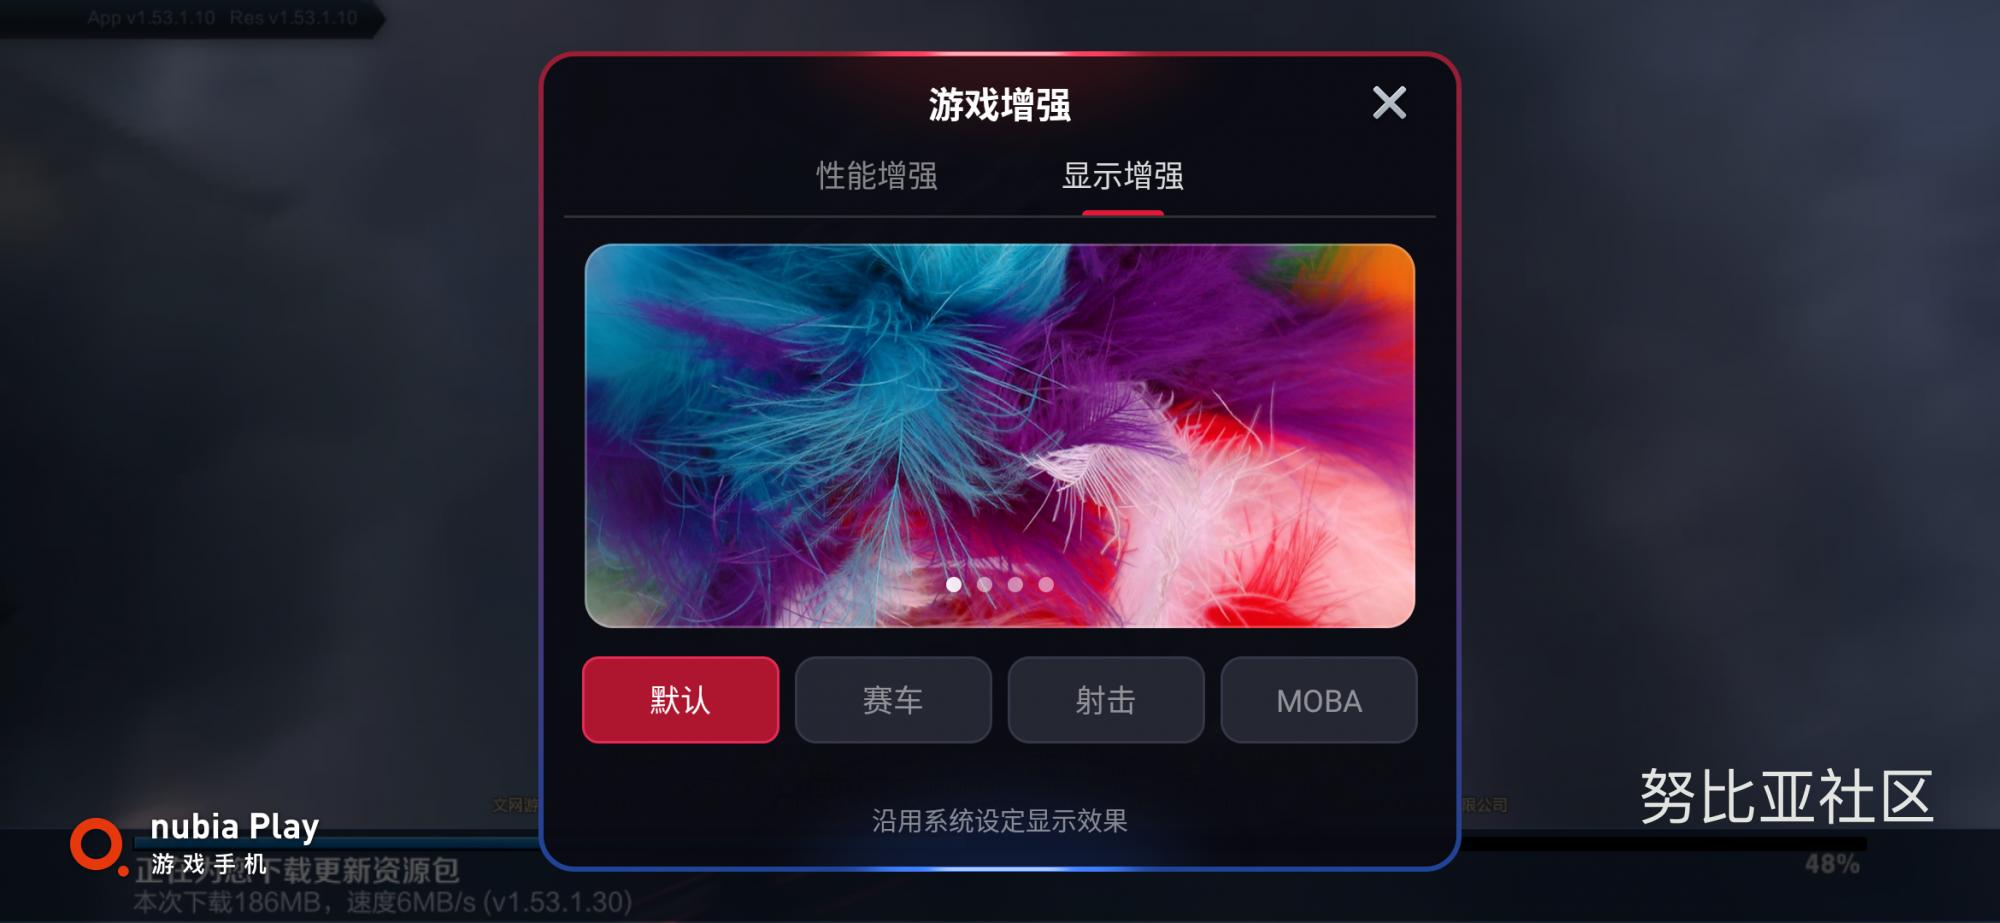 Screenshot_王者荣耀_2020-05-17-23-02-12-911.png